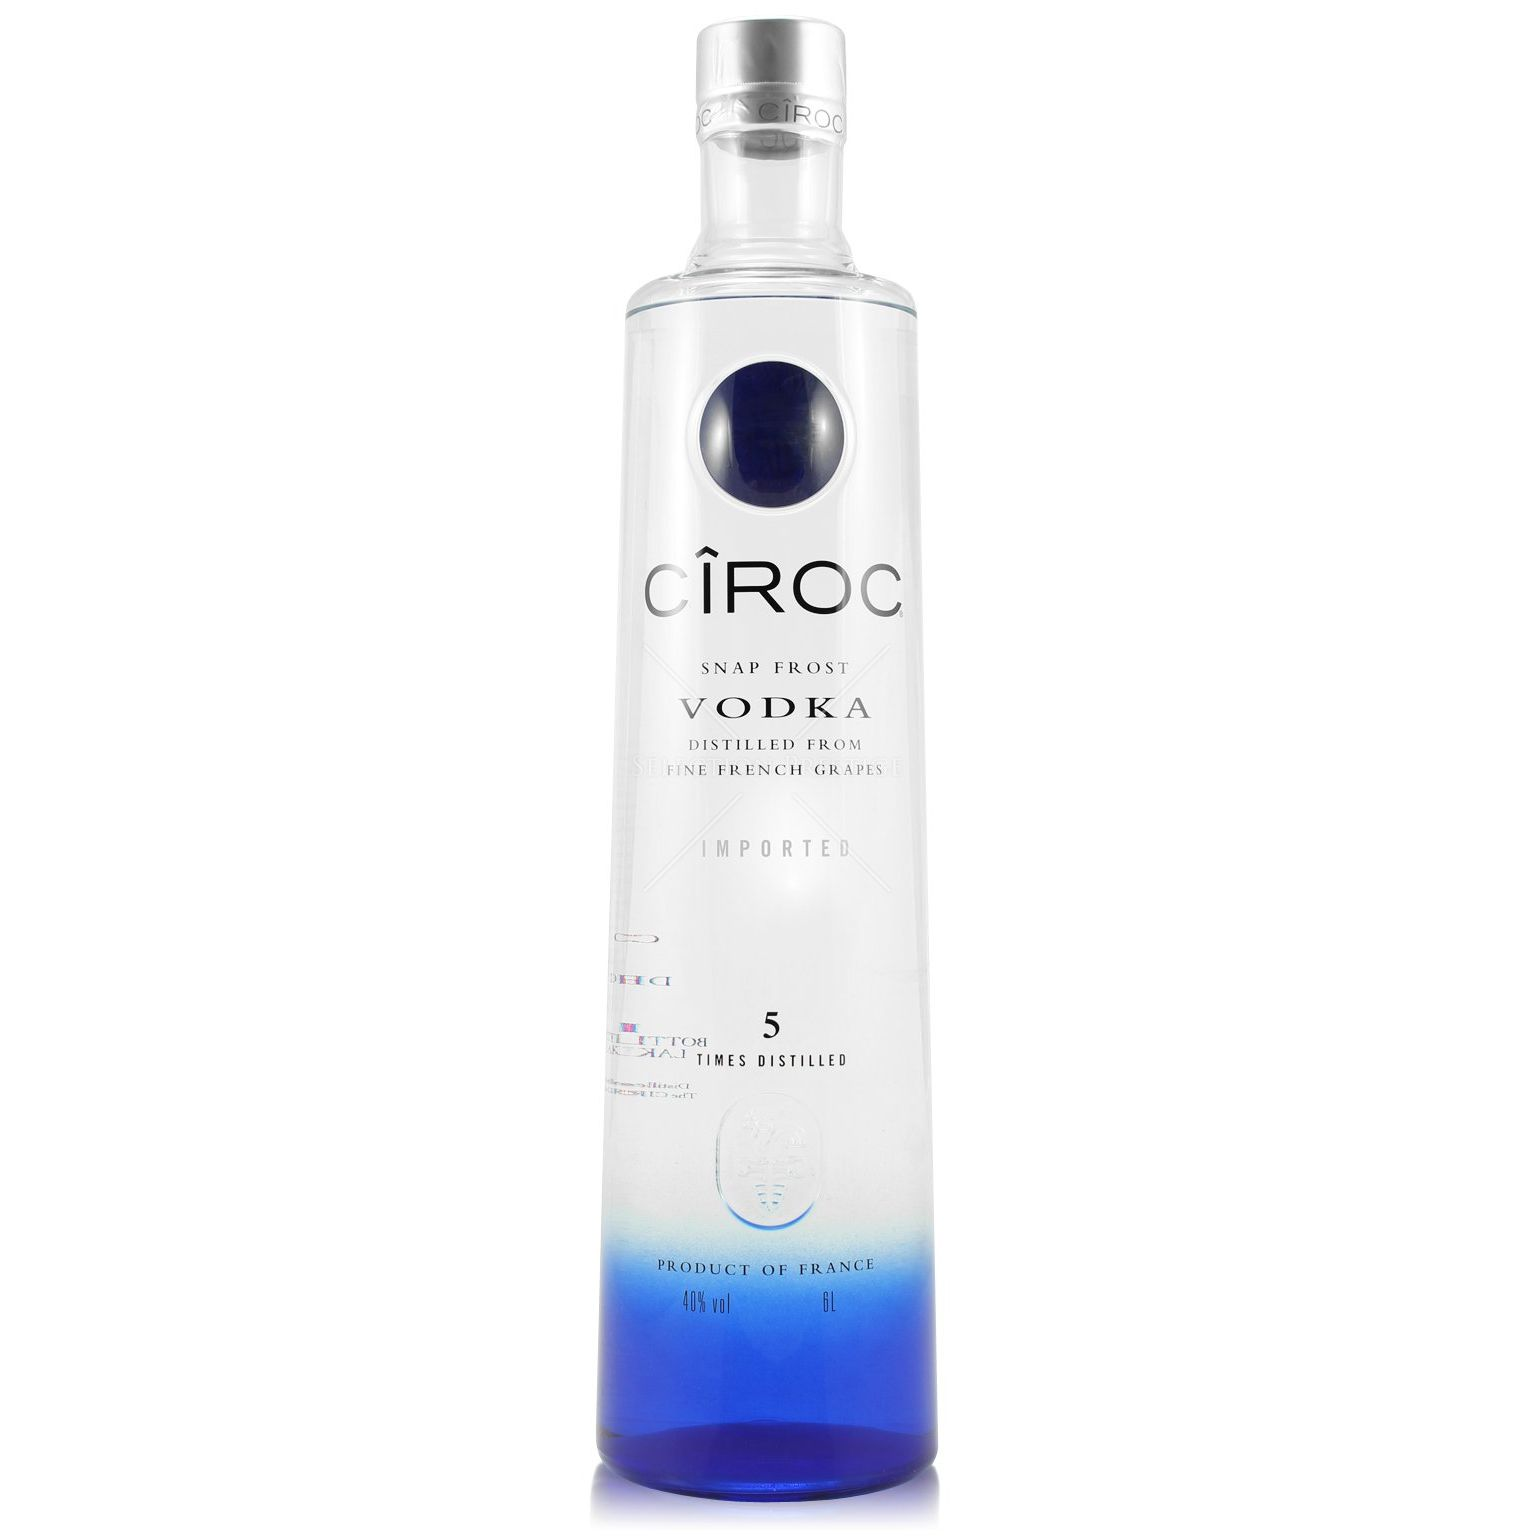 Cîroc Vodka Snap Frost 1L